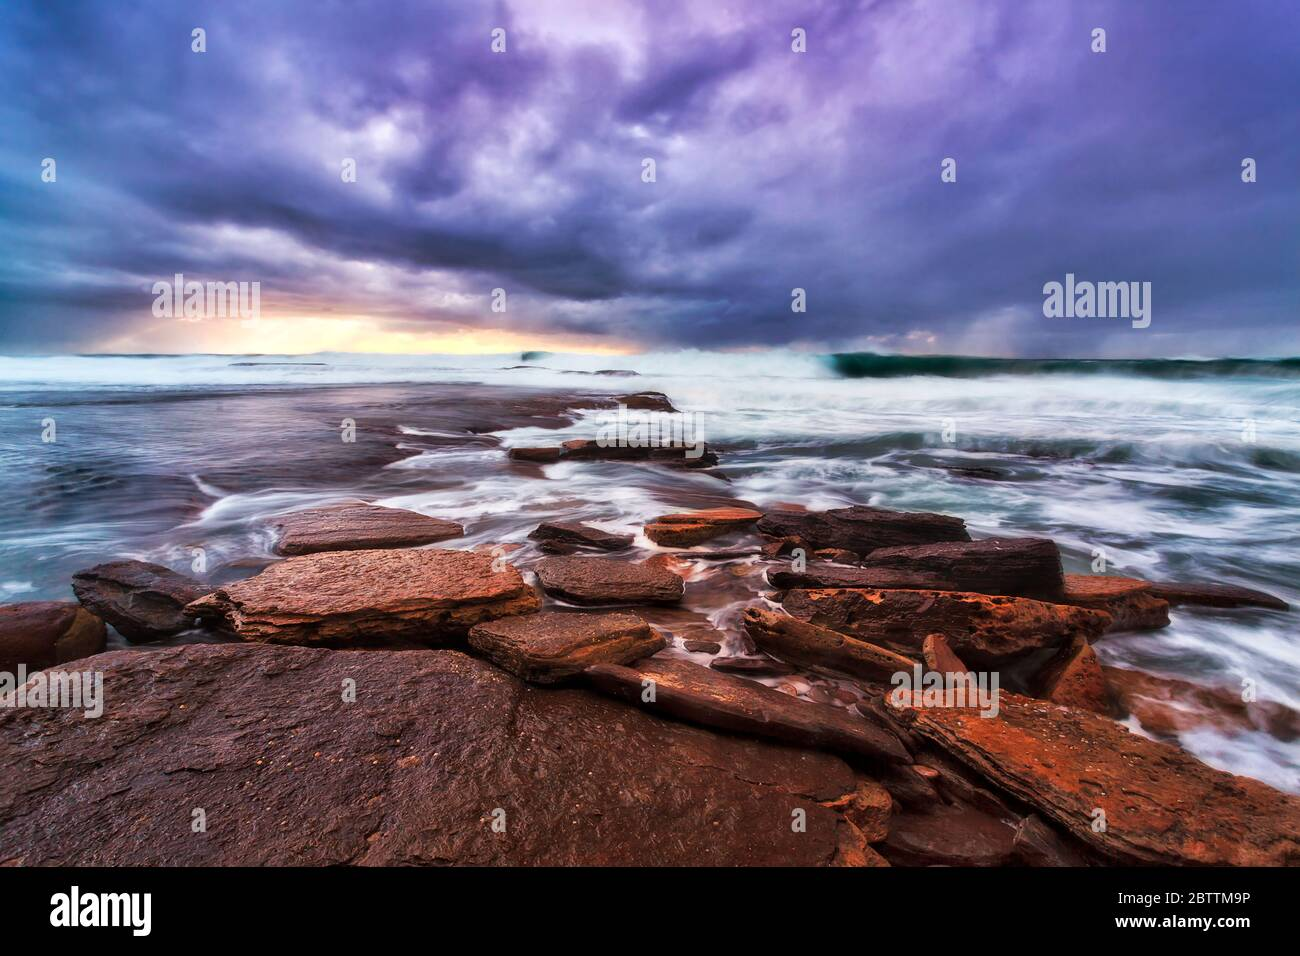 Flat Rocks High Resolution Stock Photography And Images Alamy Rocks stones horizon coast sand sea